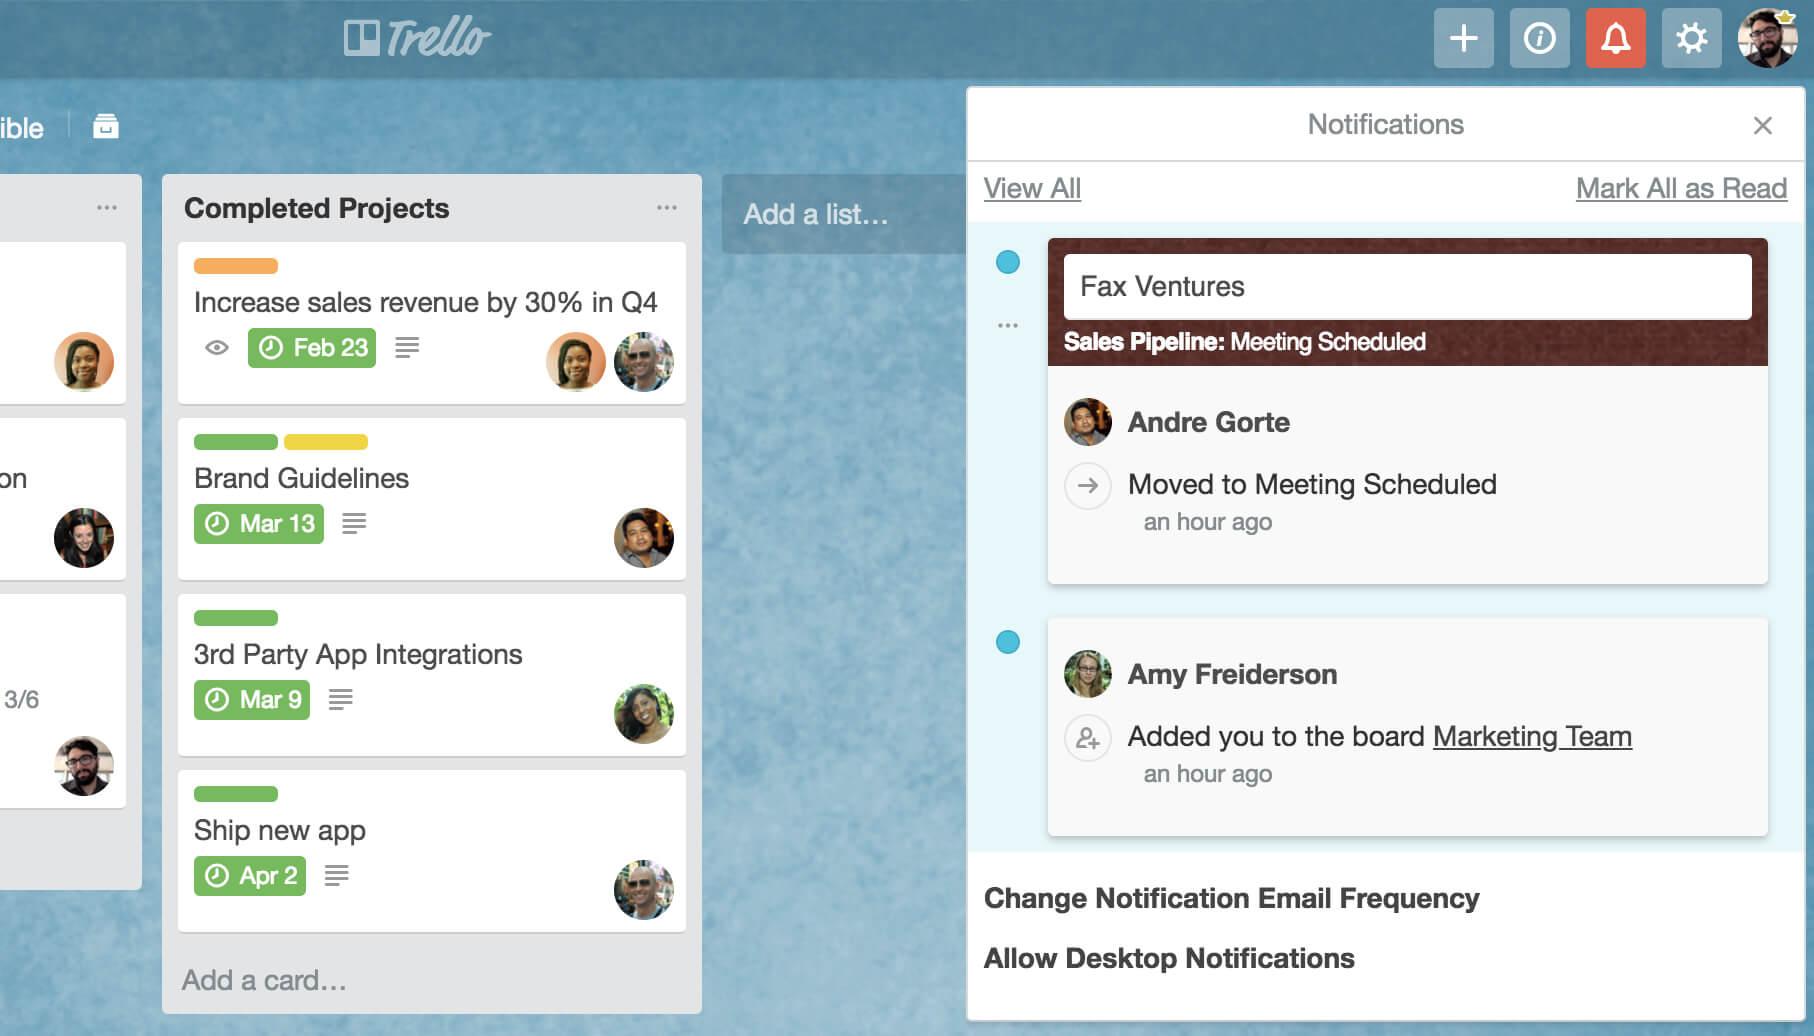 Filter Trello notifications by unread